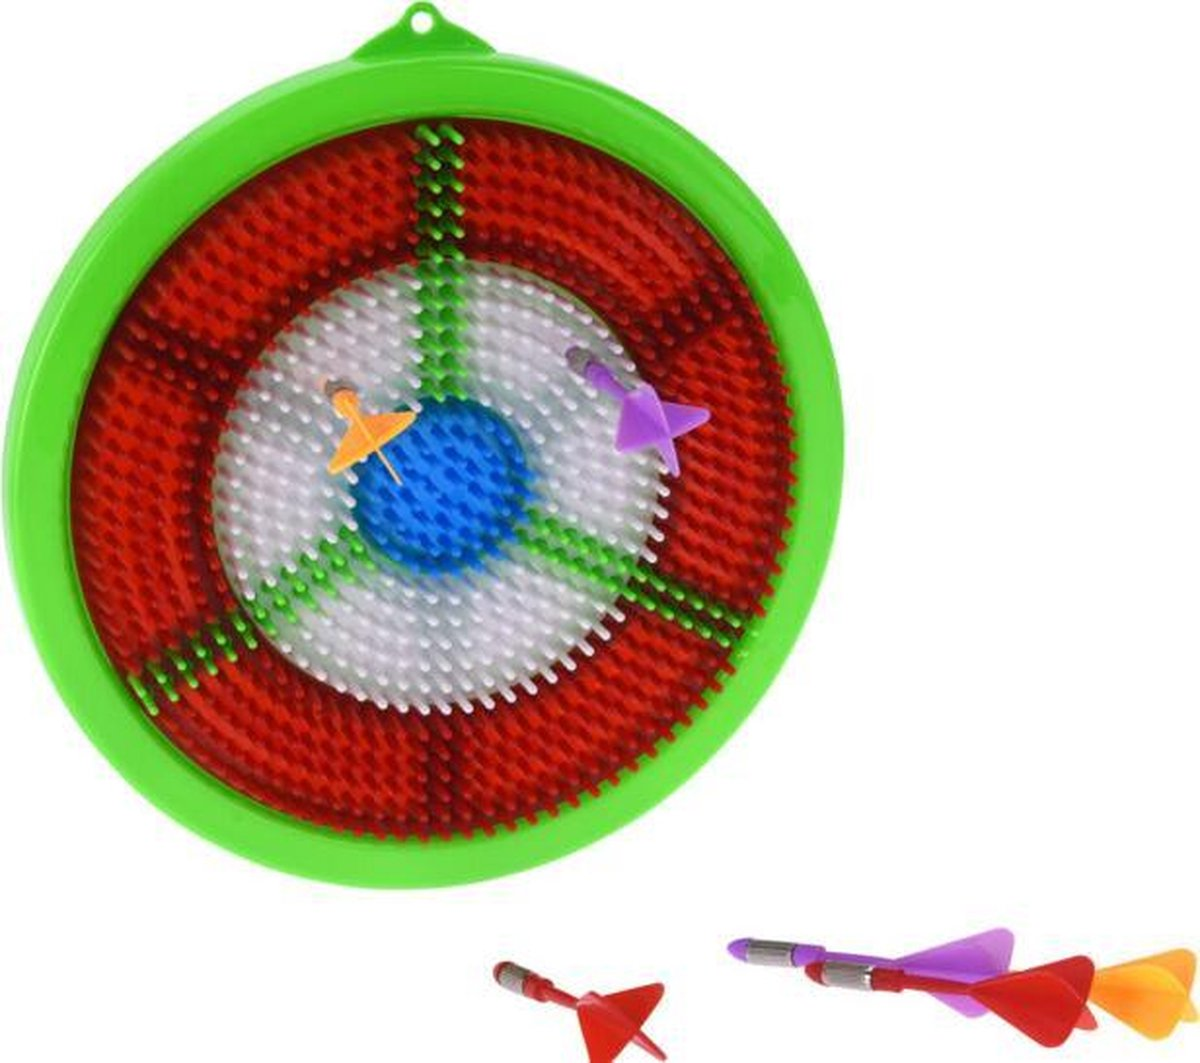 dartbordset junior 23,5 cm groen/rood 7-delig